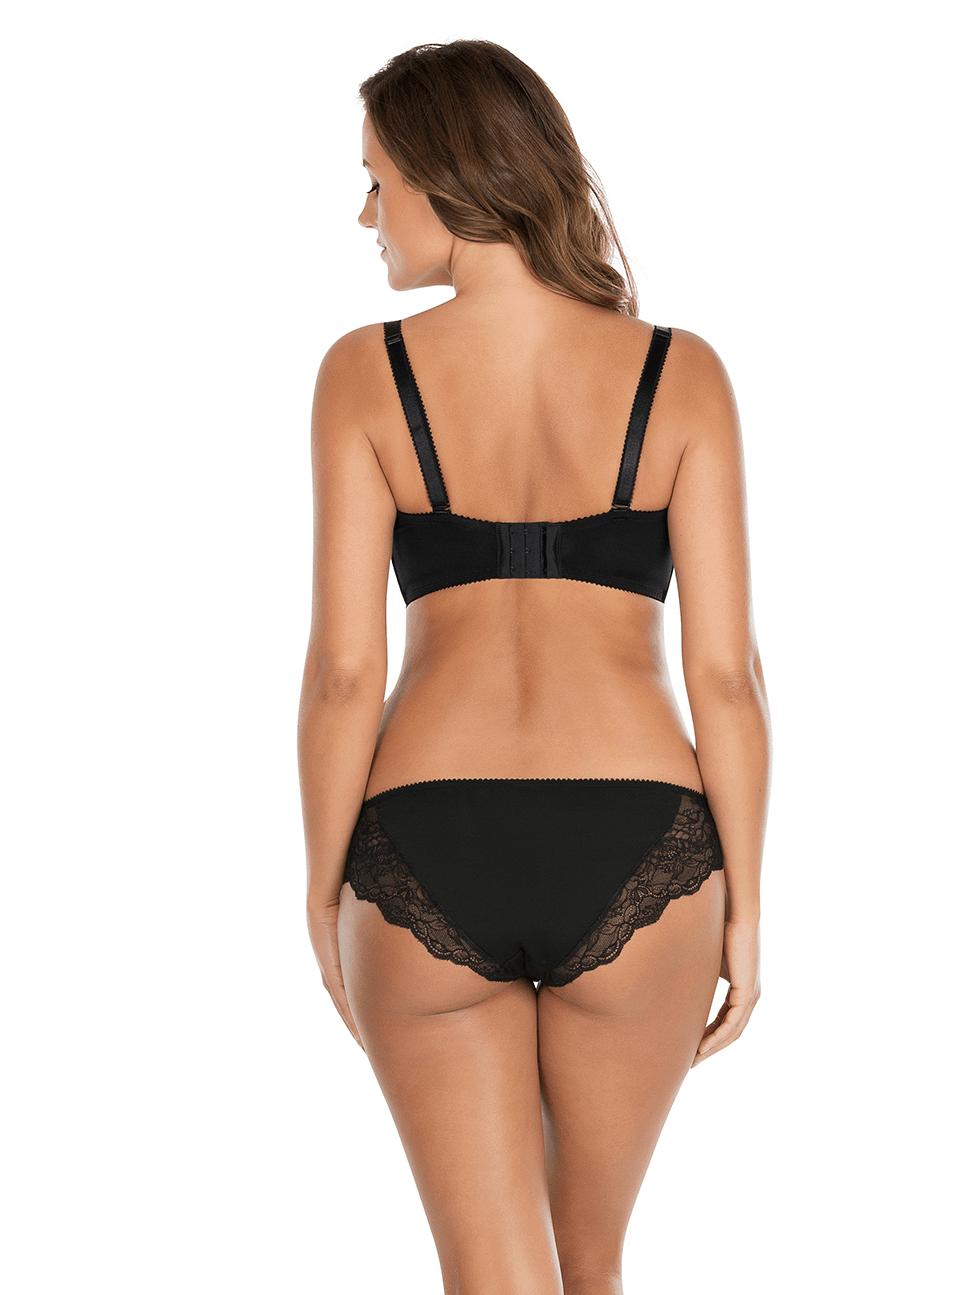 Elissa ContourUnderwireBraP5011 BikiniP5013 Black Back - Elissa Strapless Bra Black P5011